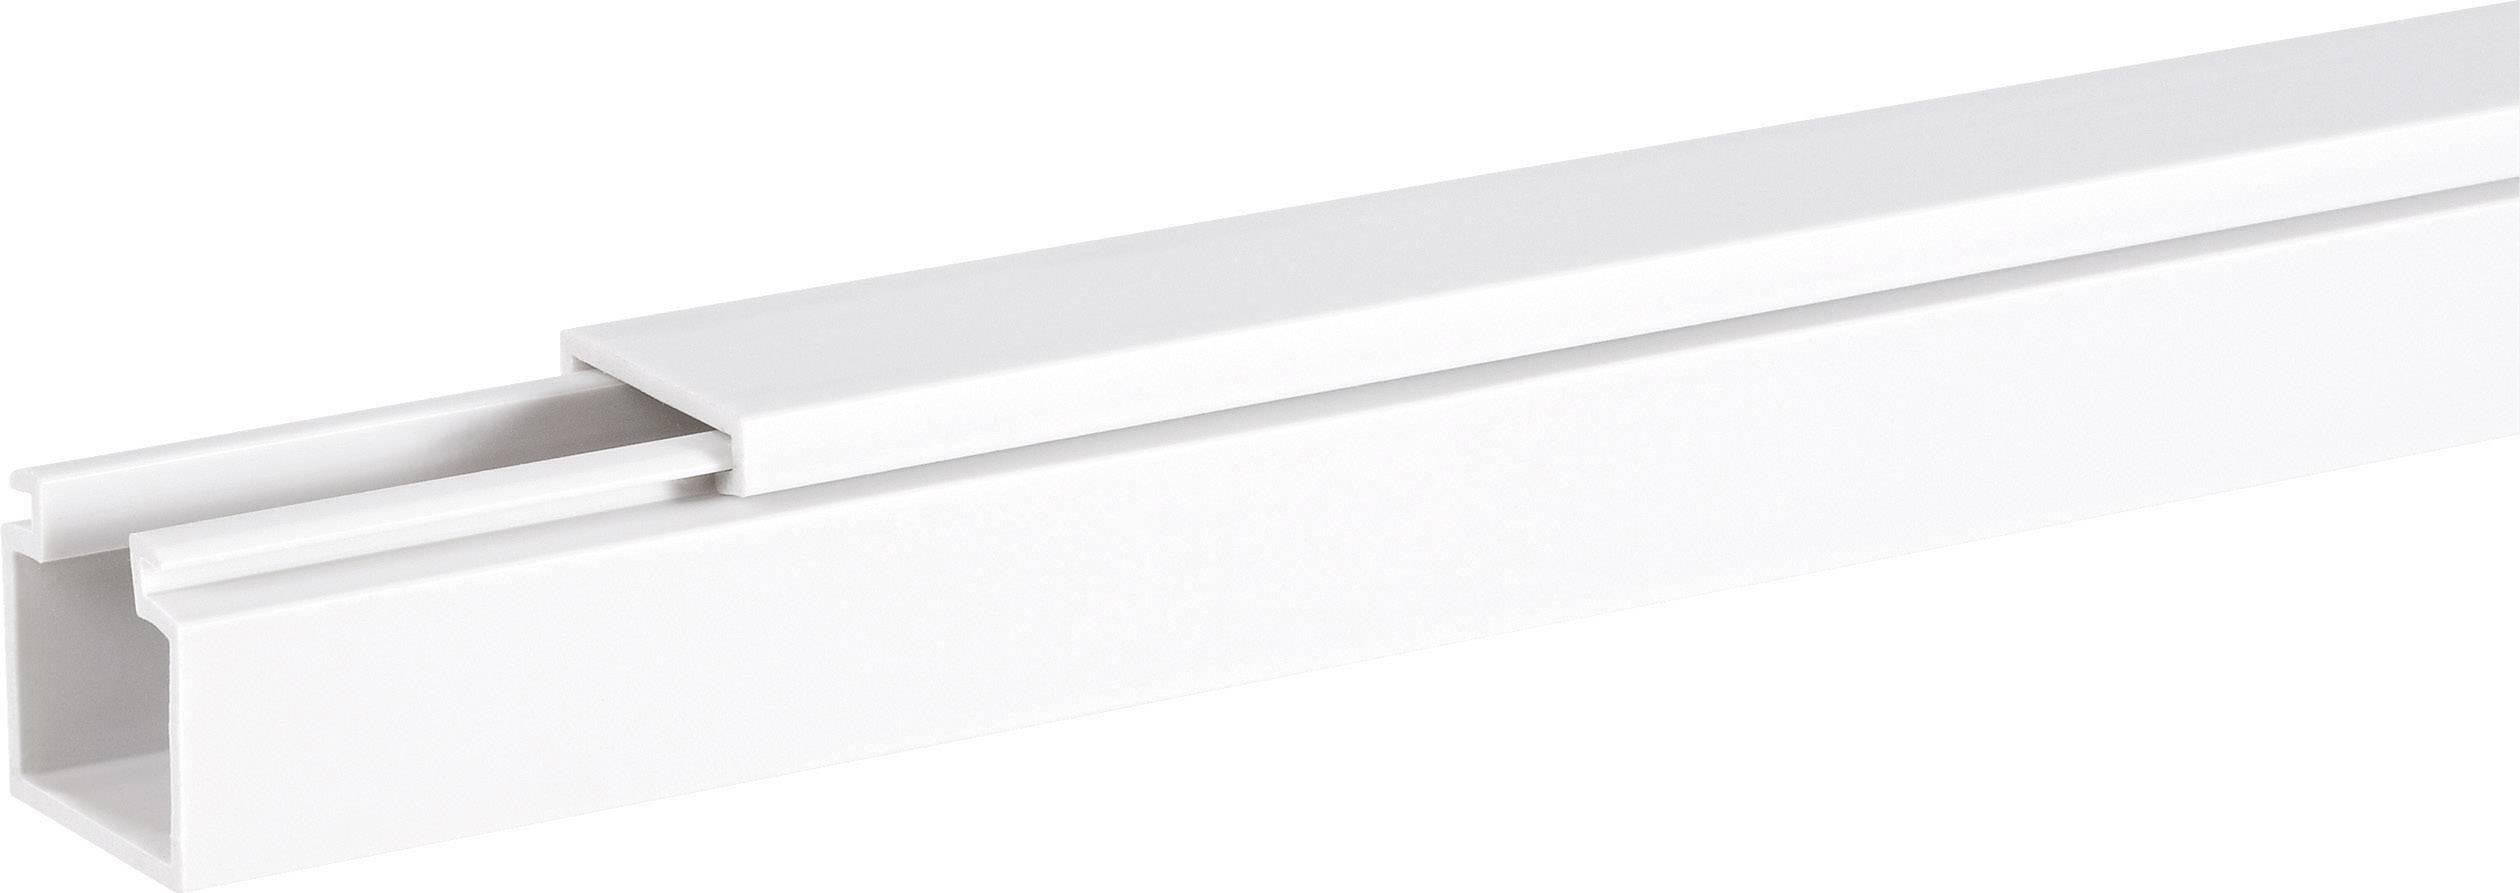 Káblová lišta Hager LF1501509010, 1 ks, čisto biela